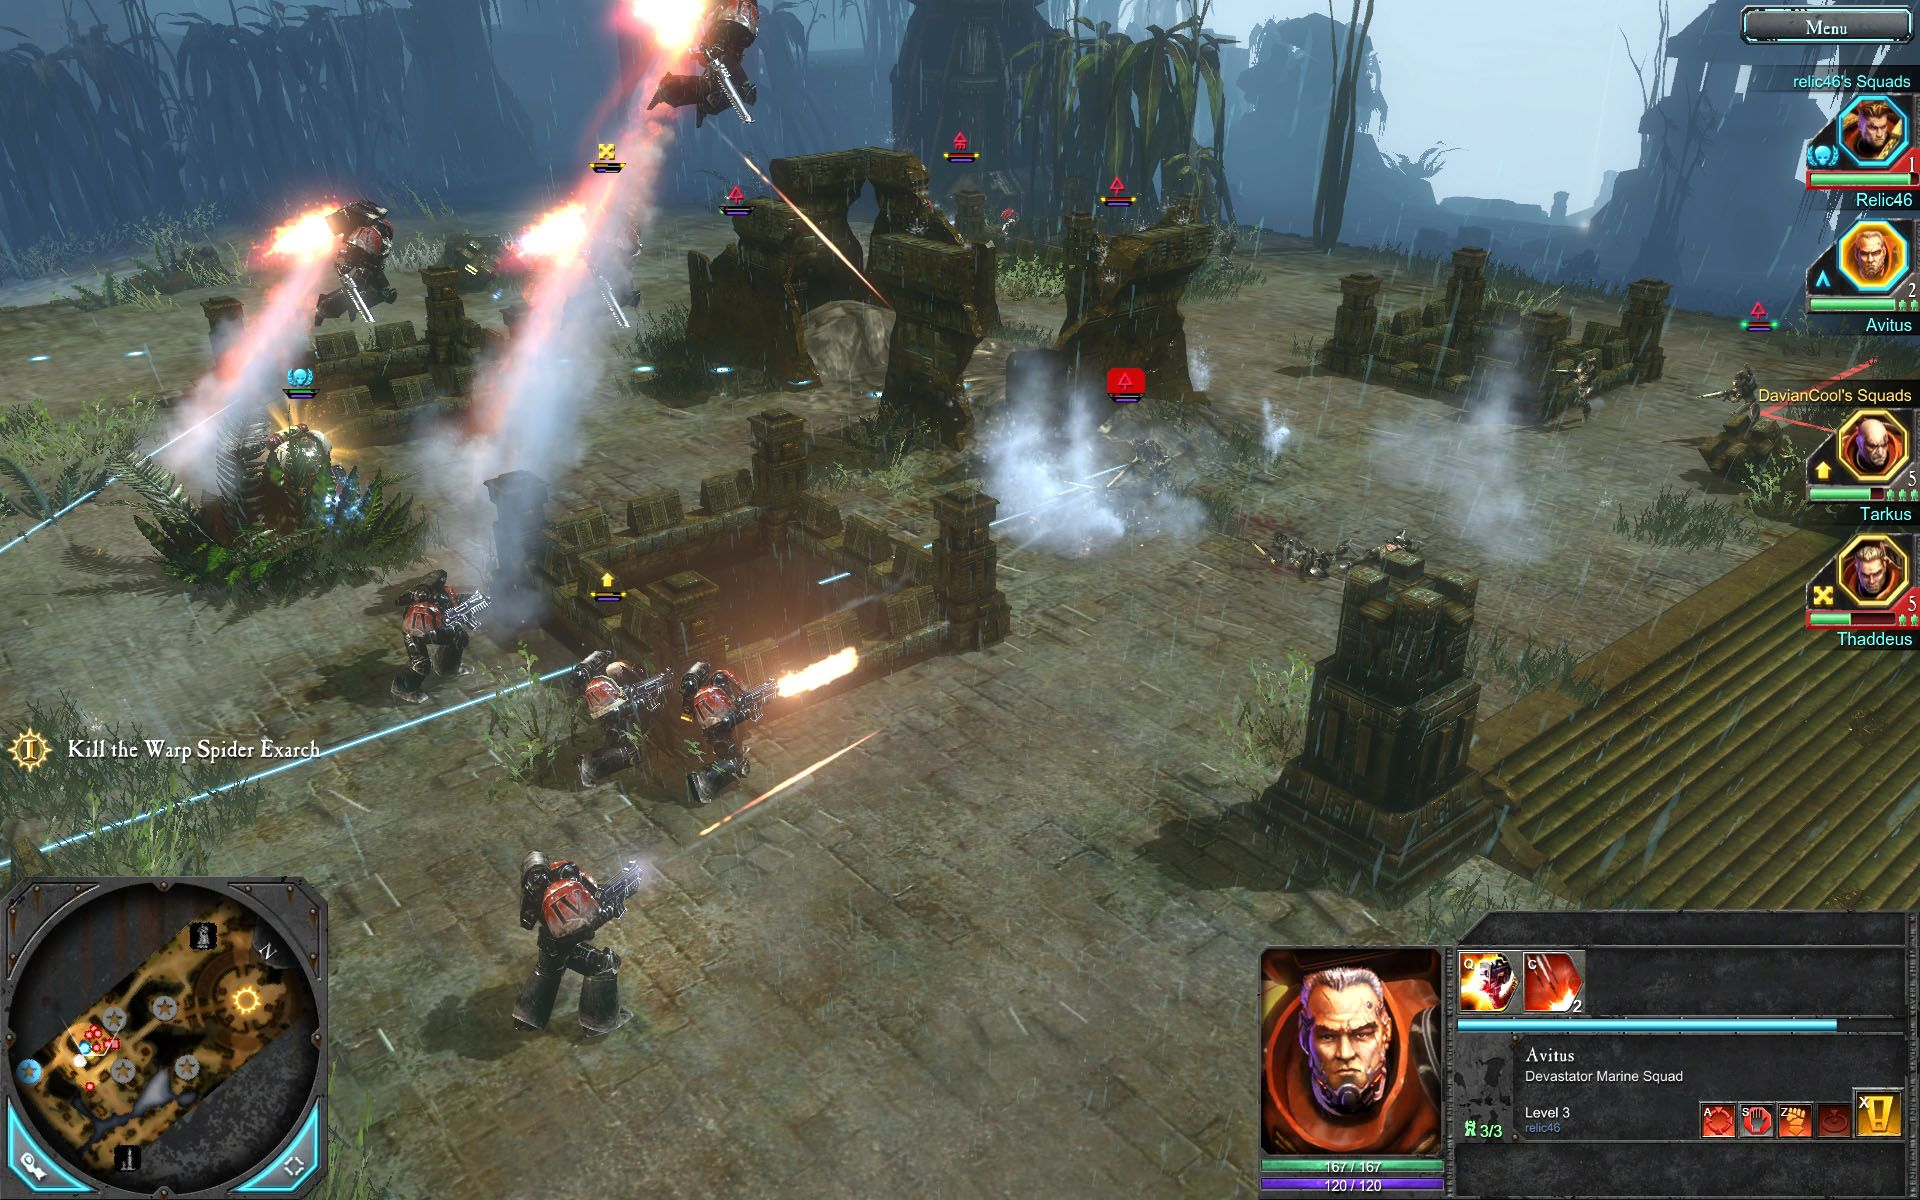 Скриншоты Warhammer 40000 Dawn of War 2 - война продолжается.